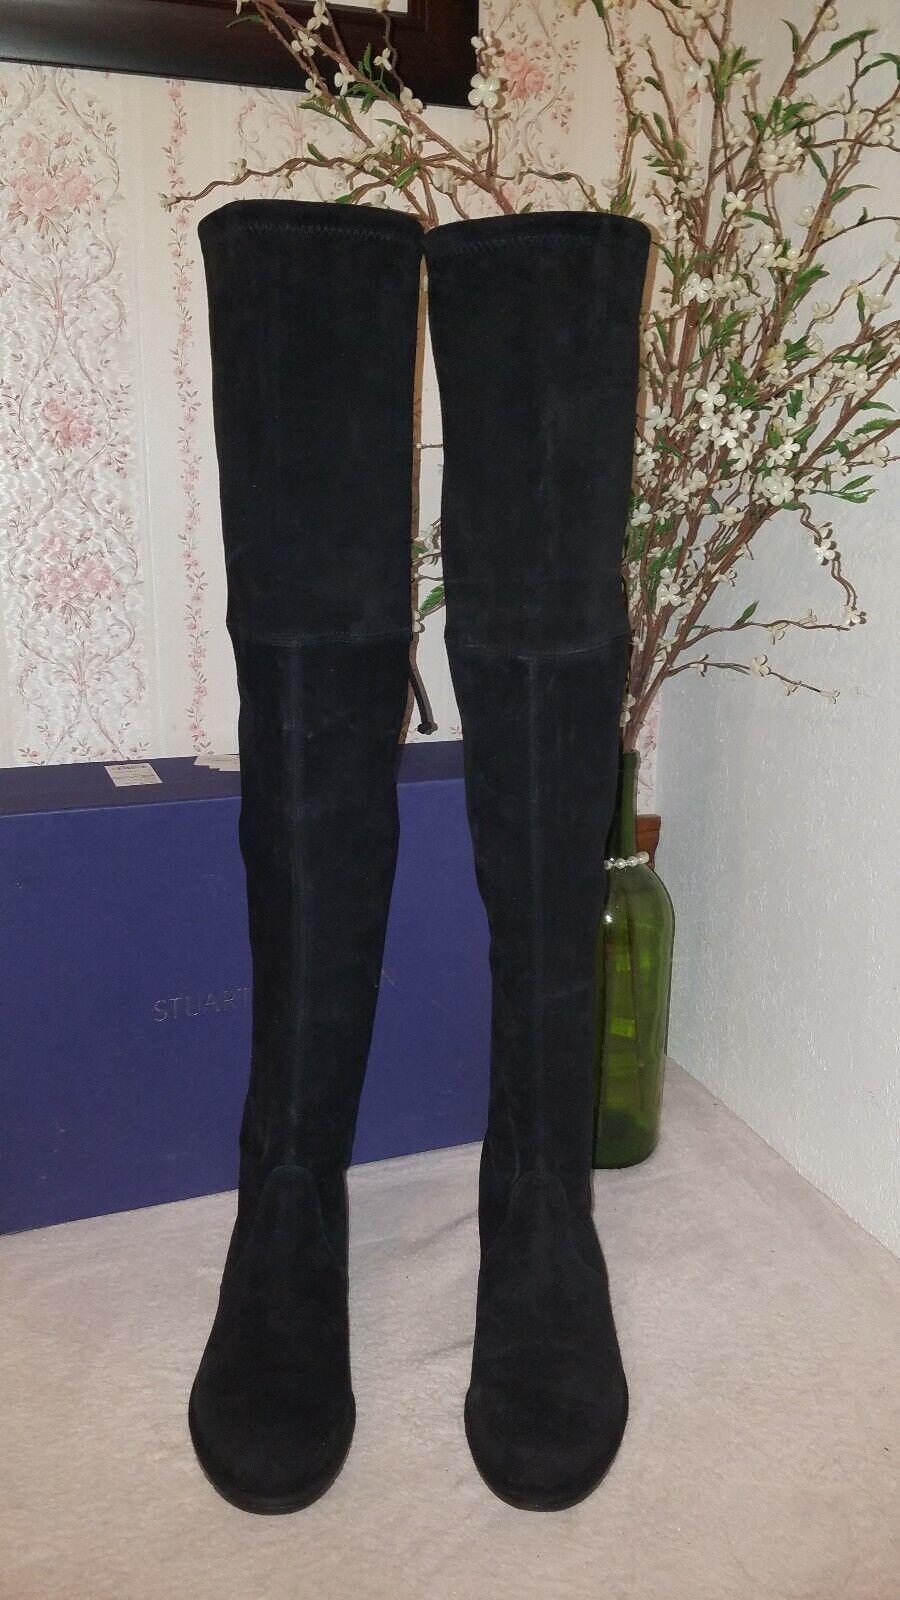 Stuart Weitzman Llanura Encima De La Rodilla Bota (mujeres) Gamuza Negra Talla 8.5 m  798